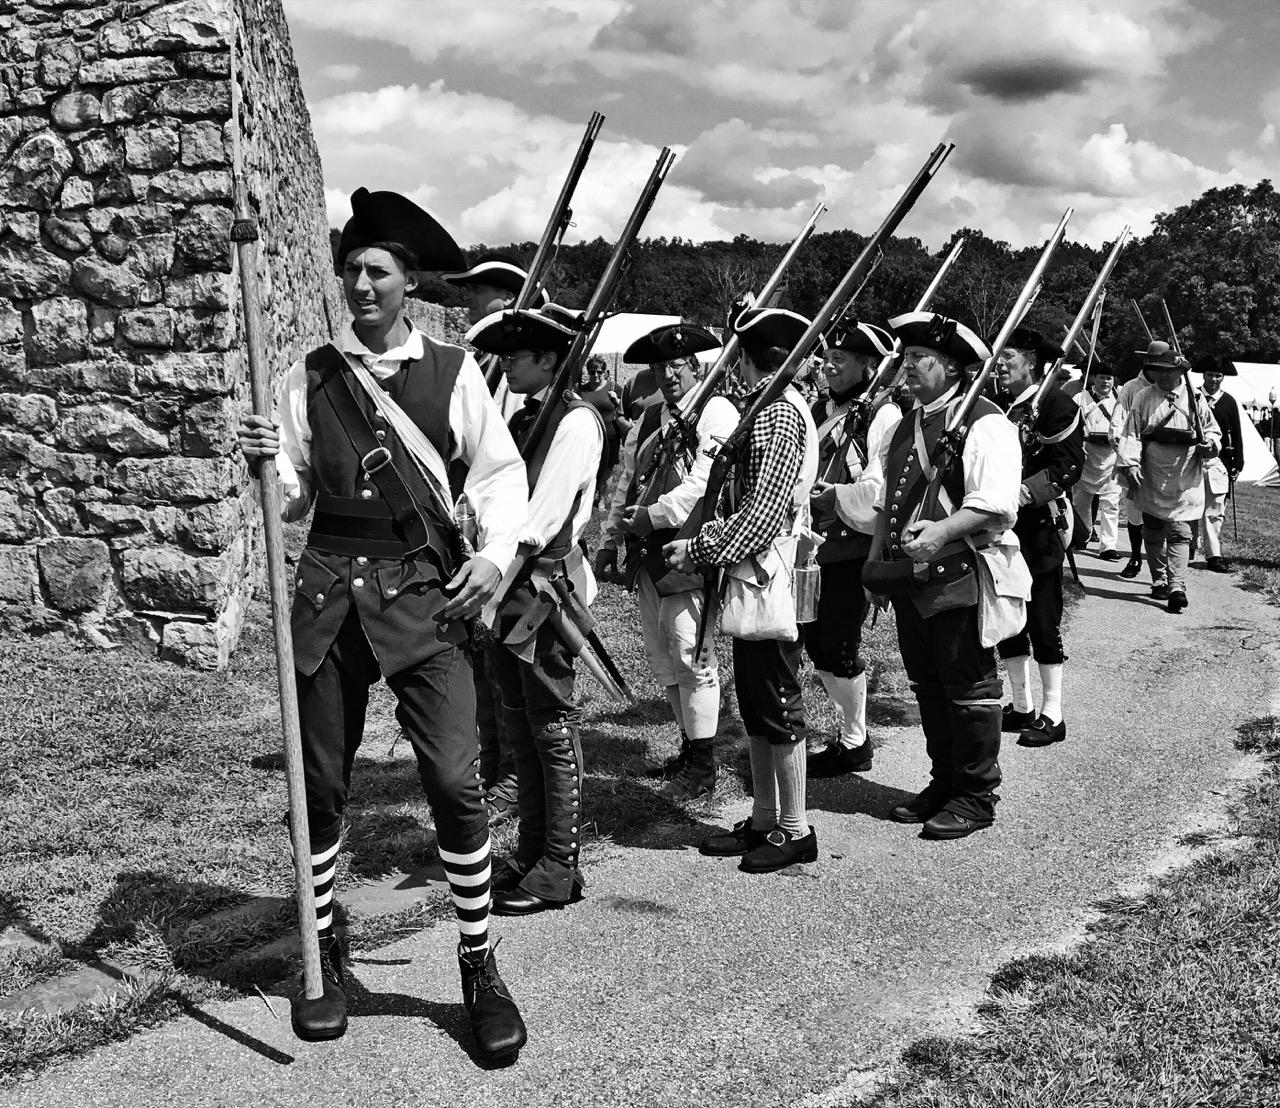 Reenactment of French war